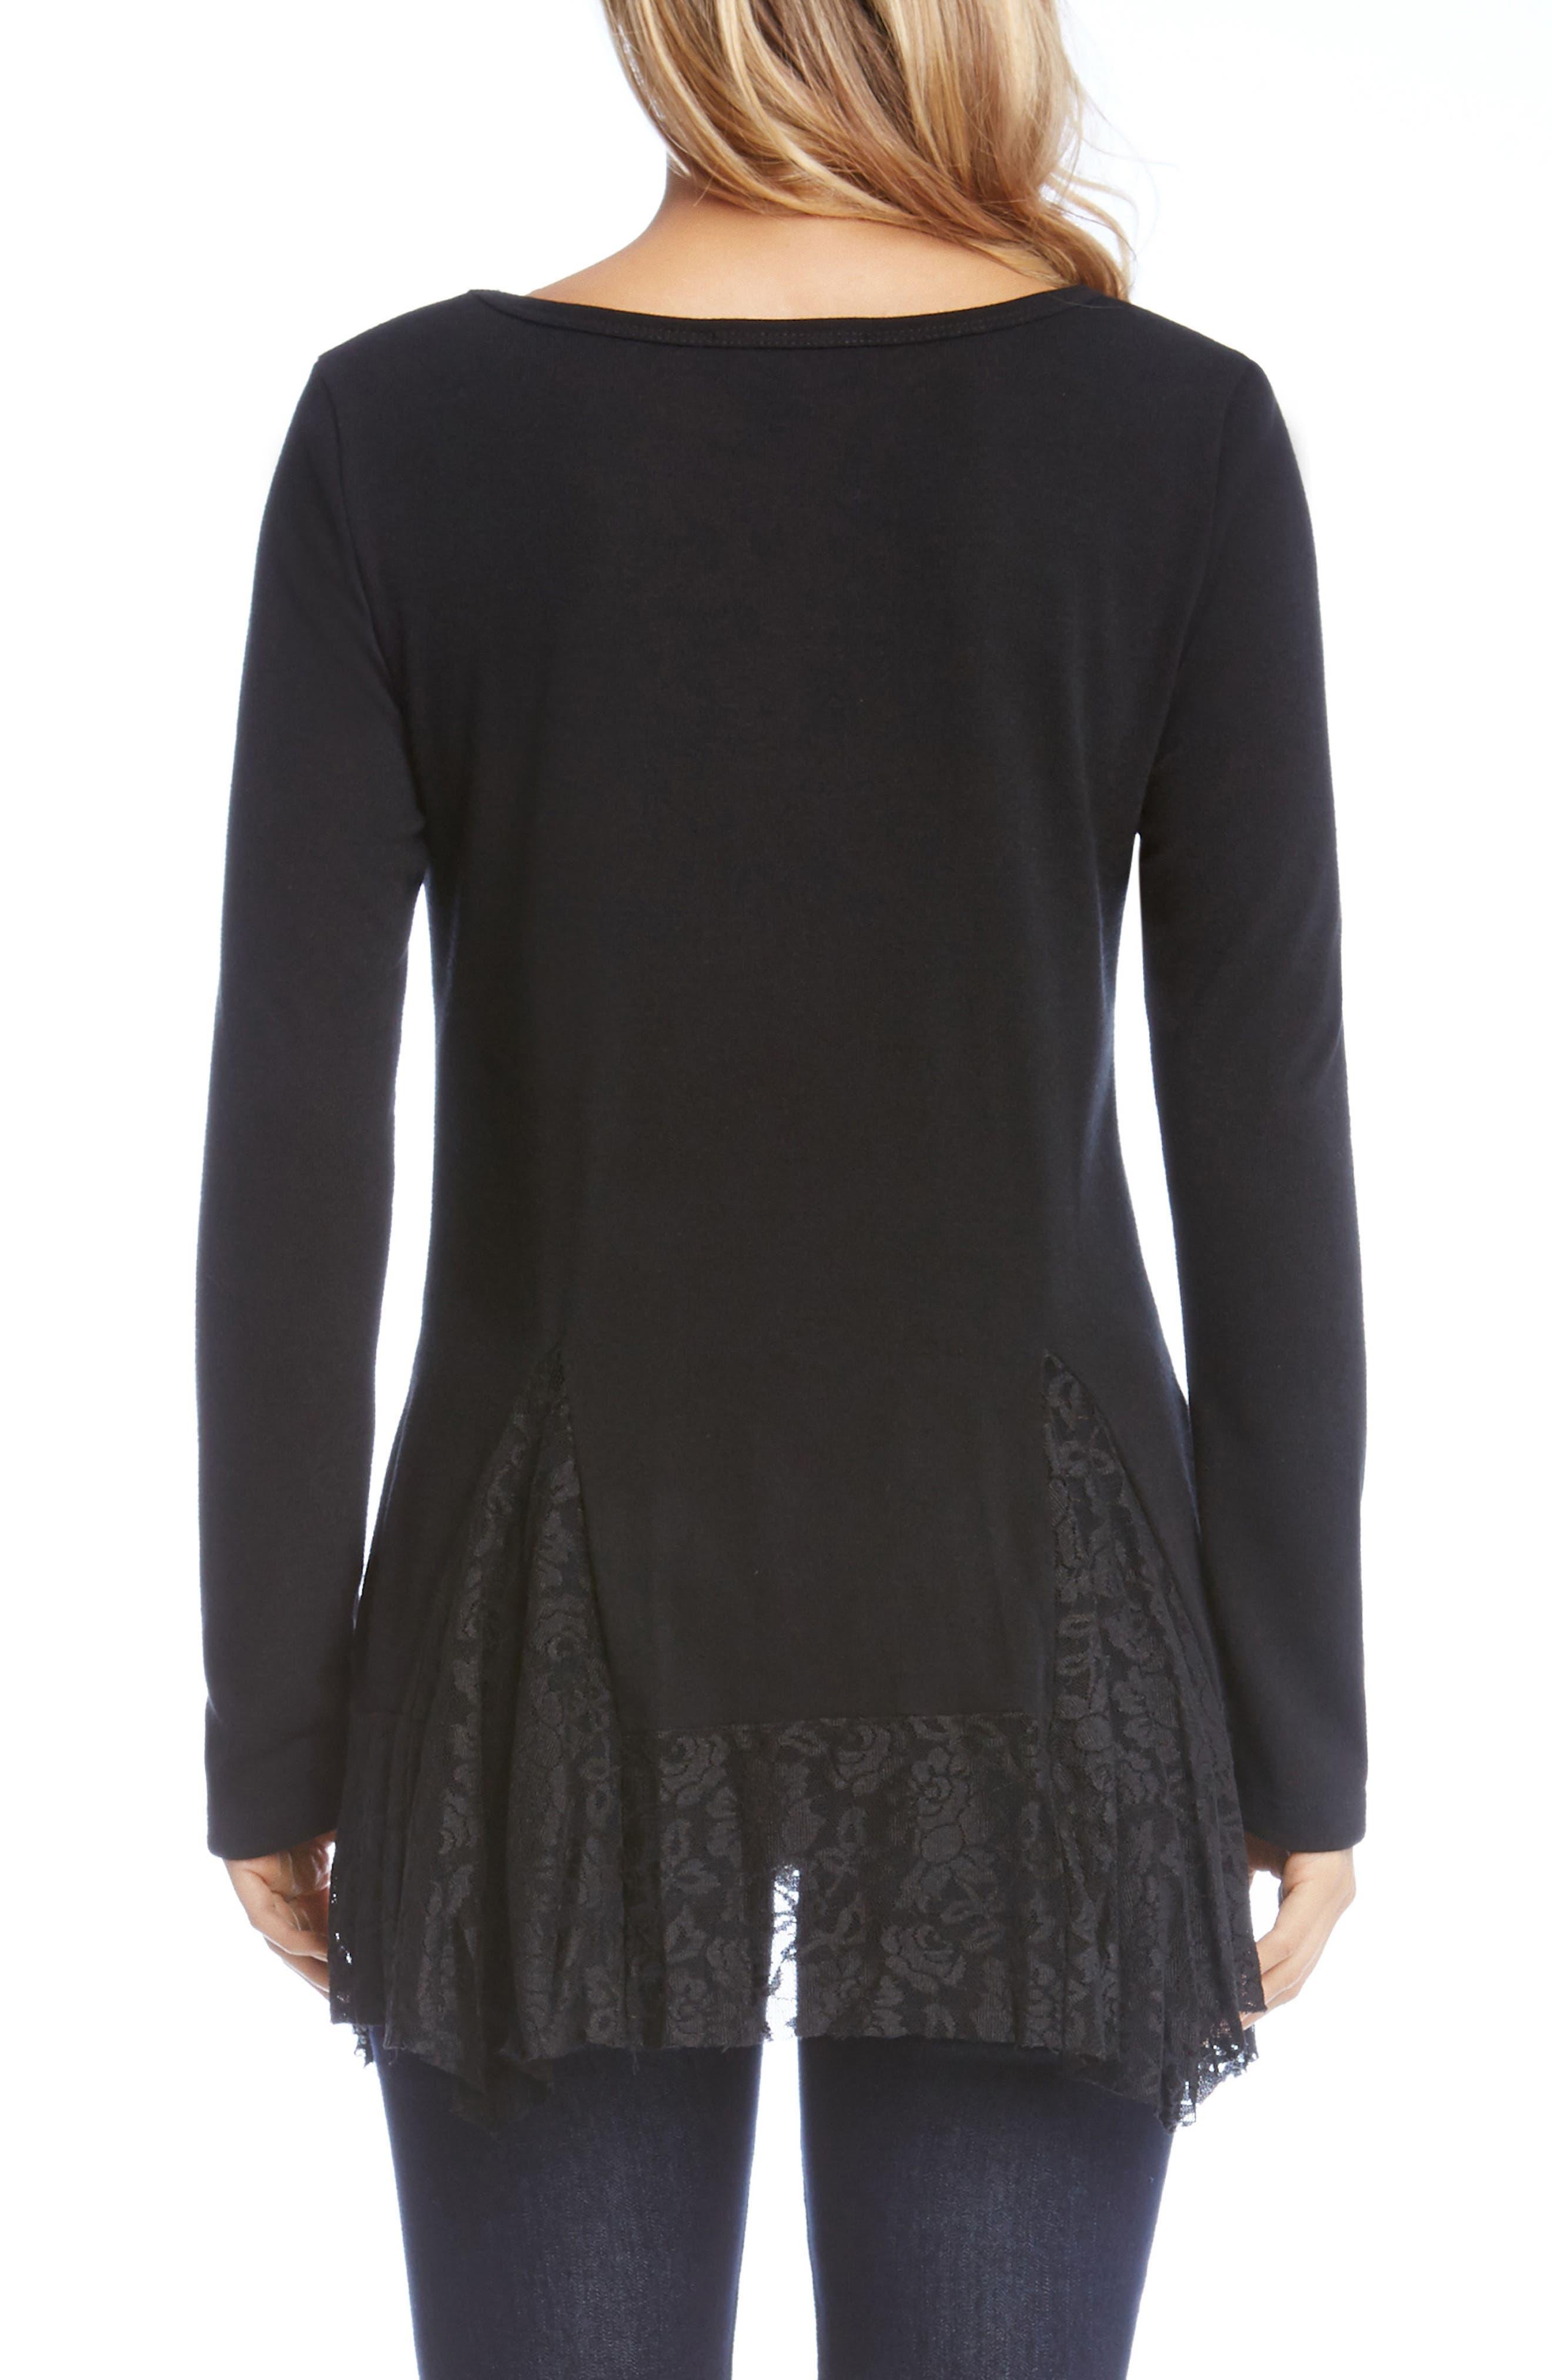 Karen Karen Lace Inset Sweater,                             Alternate thumbnail 2, color,                             001